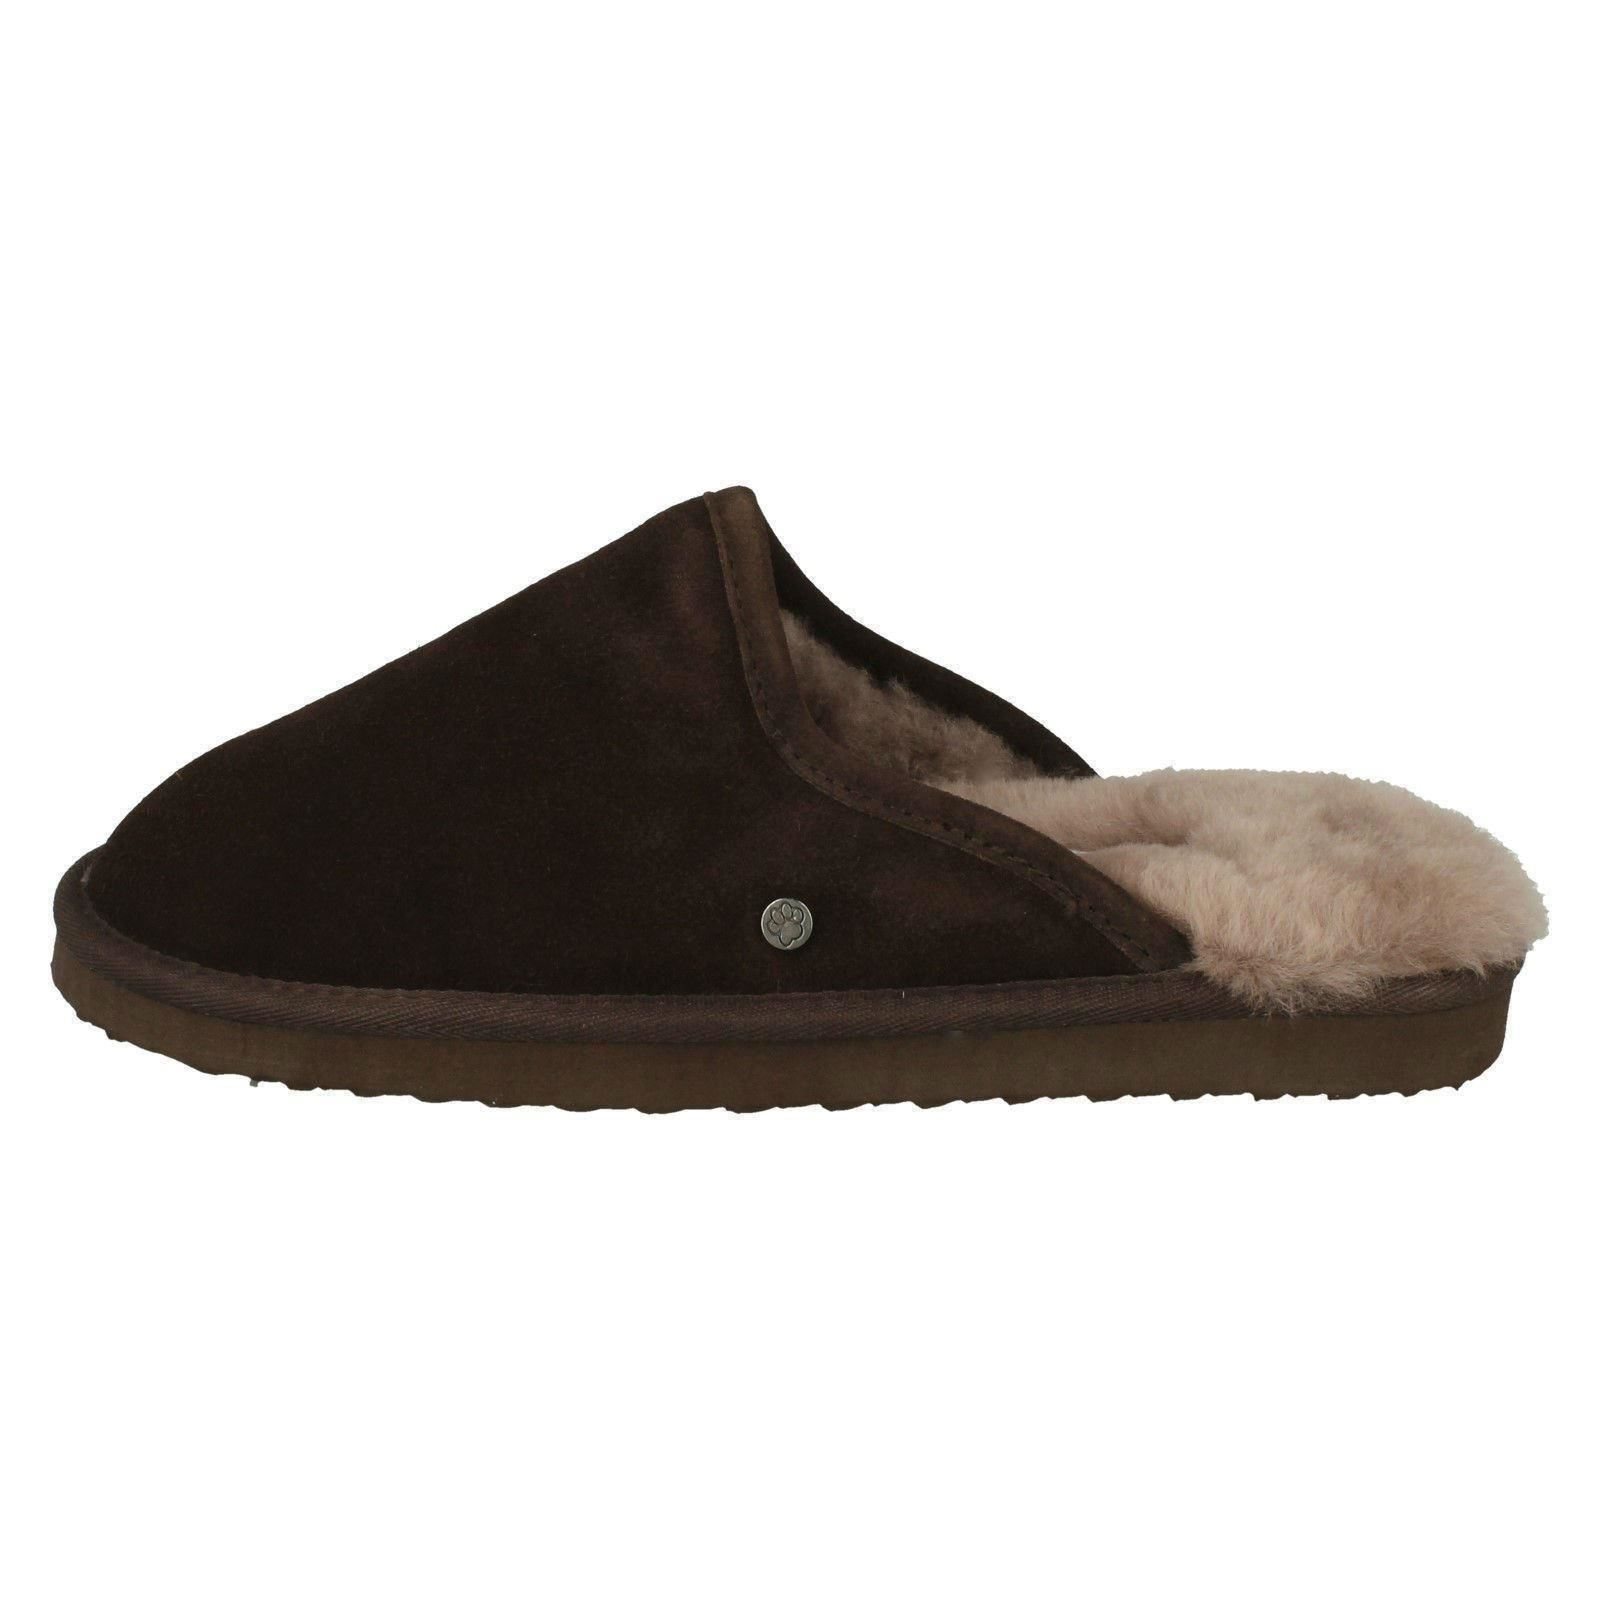 Lined Uomo Padders Genuine Lined  Sheepskin Mule Slippers Nevis 78403c